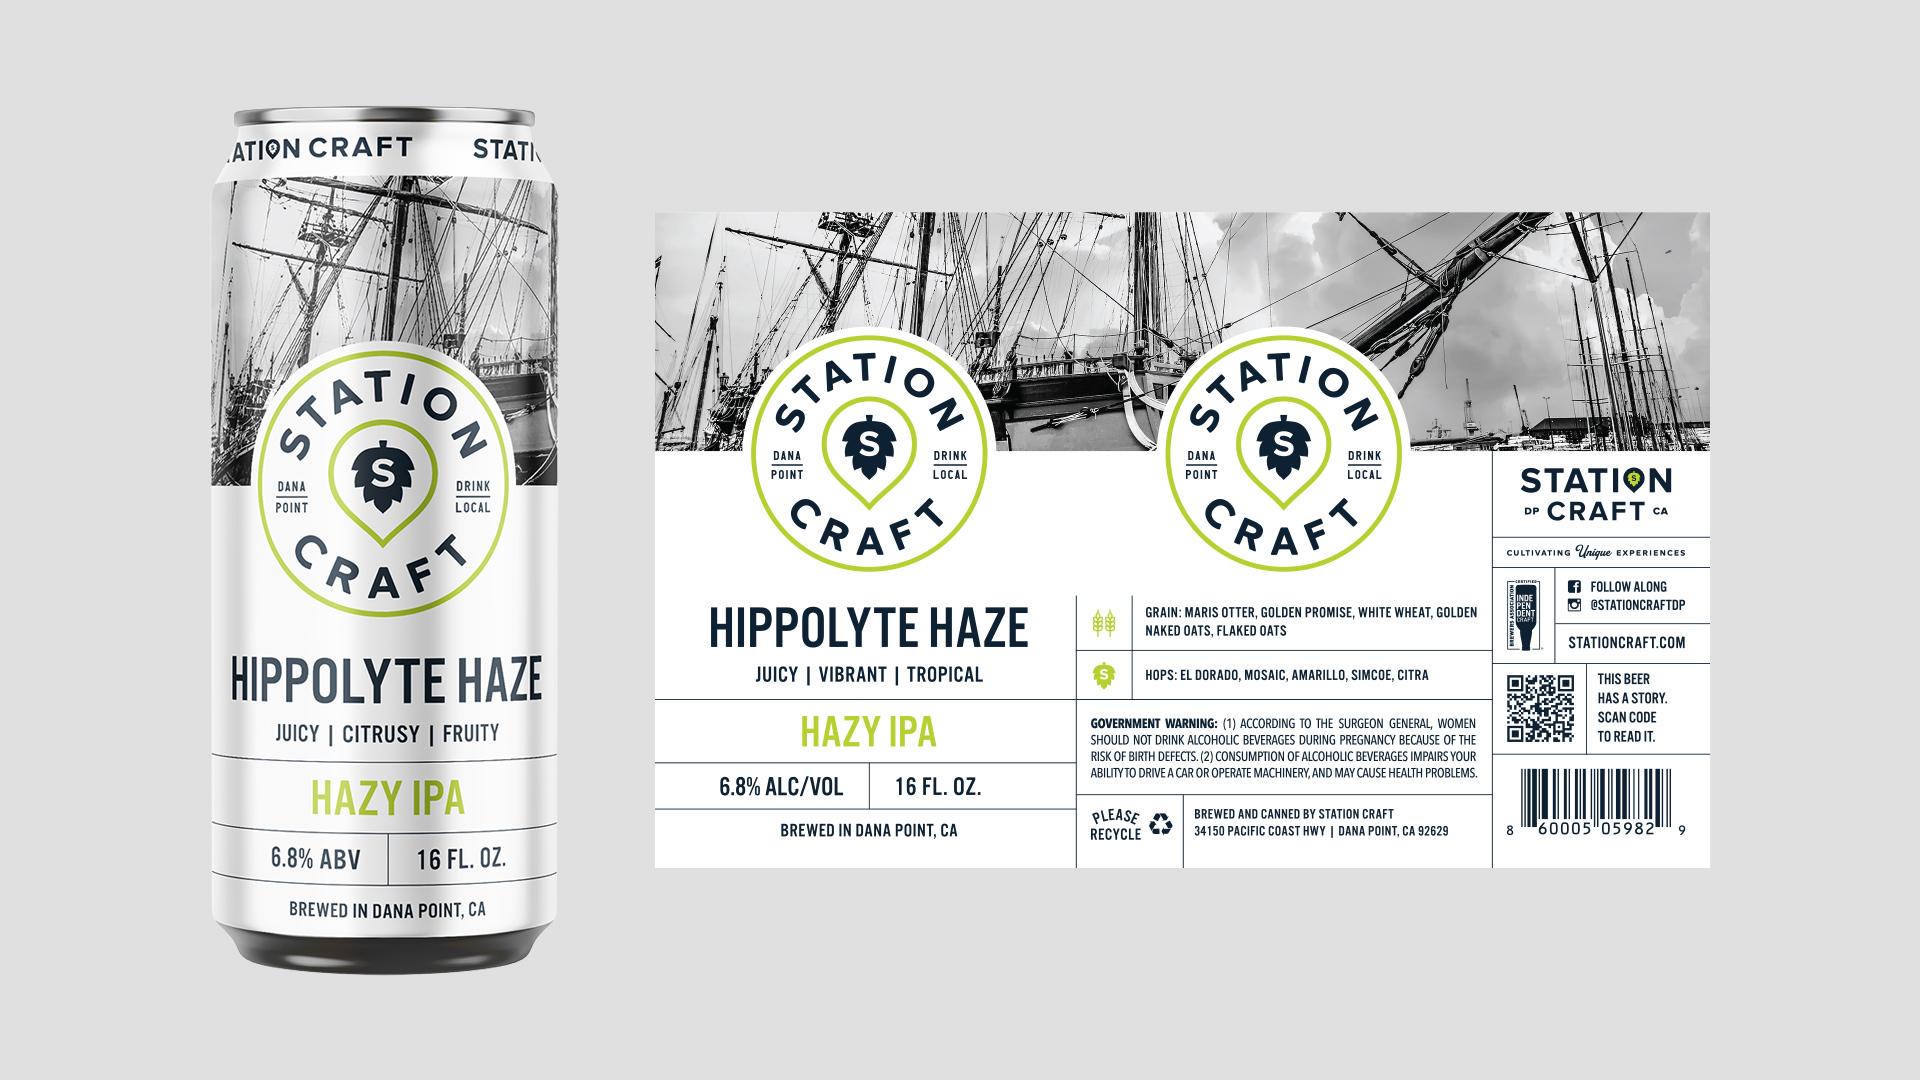 Station Craft Hippolyte Haze Can Design - Unsung Studio Branding